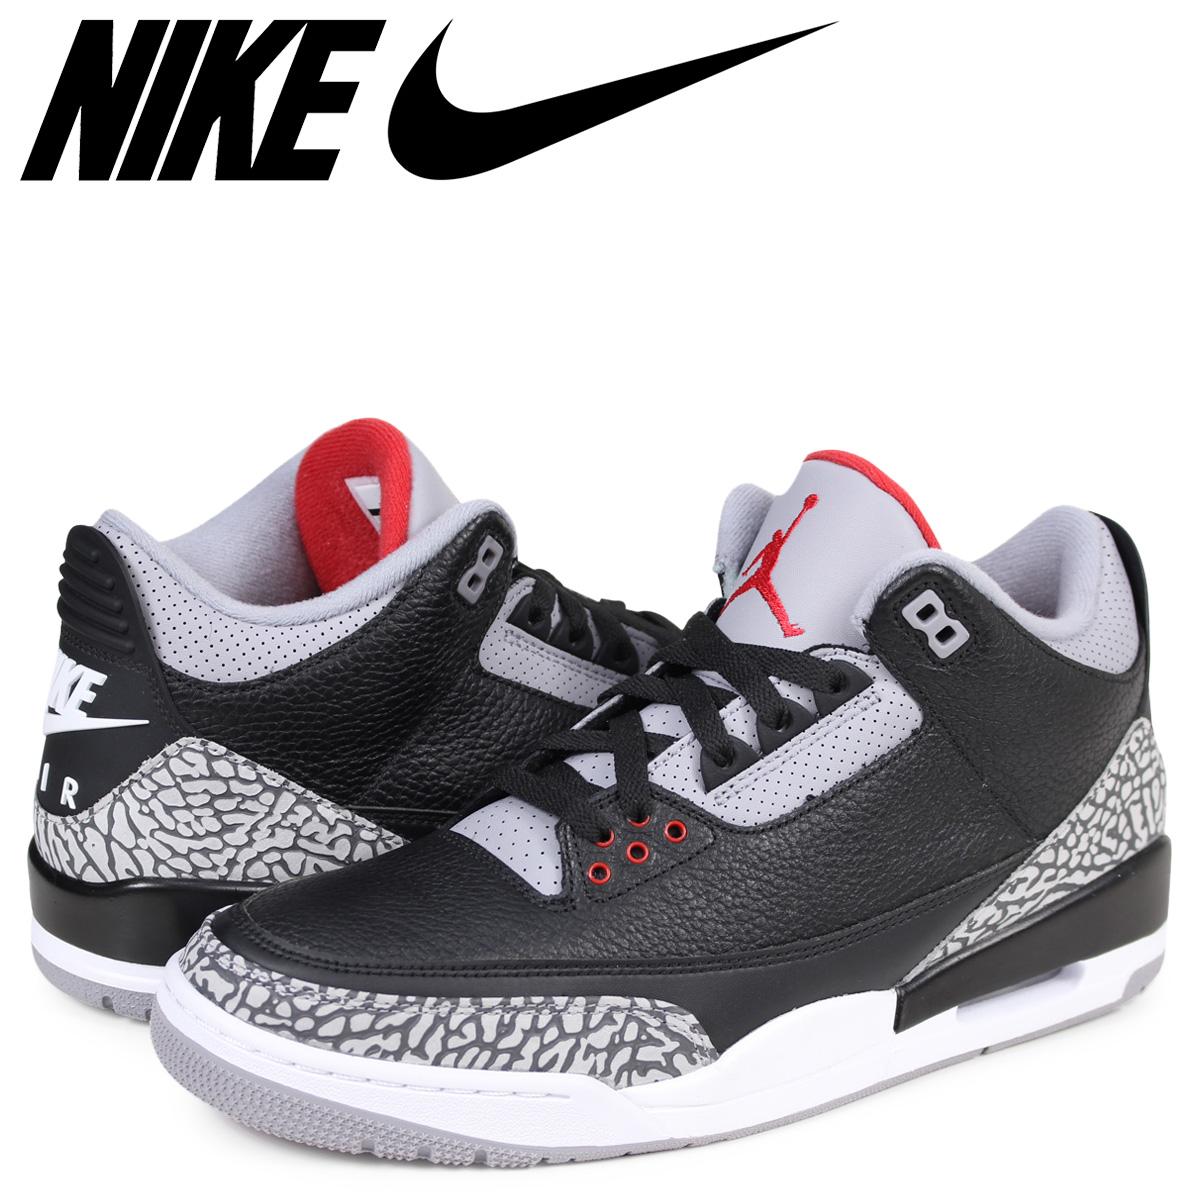 free shipping 494cc 38eec NIKE AIR JORDAN 3 RETRO OG Nike Air Jordan 3 nostalgic sneakers men black  854,262-001 [183]